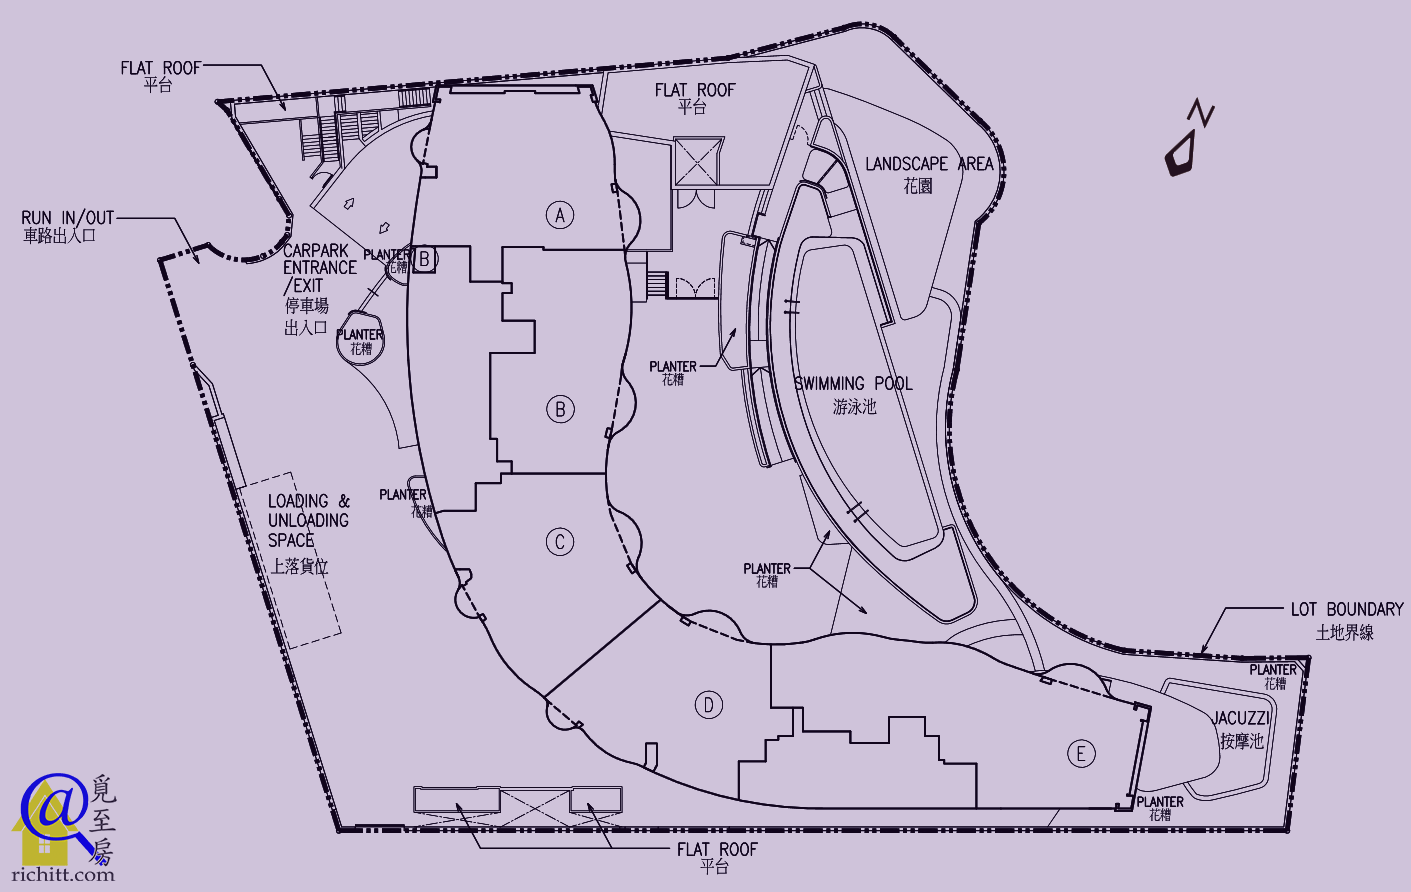 MOUNT PARKER RESIDENCES 布局圖